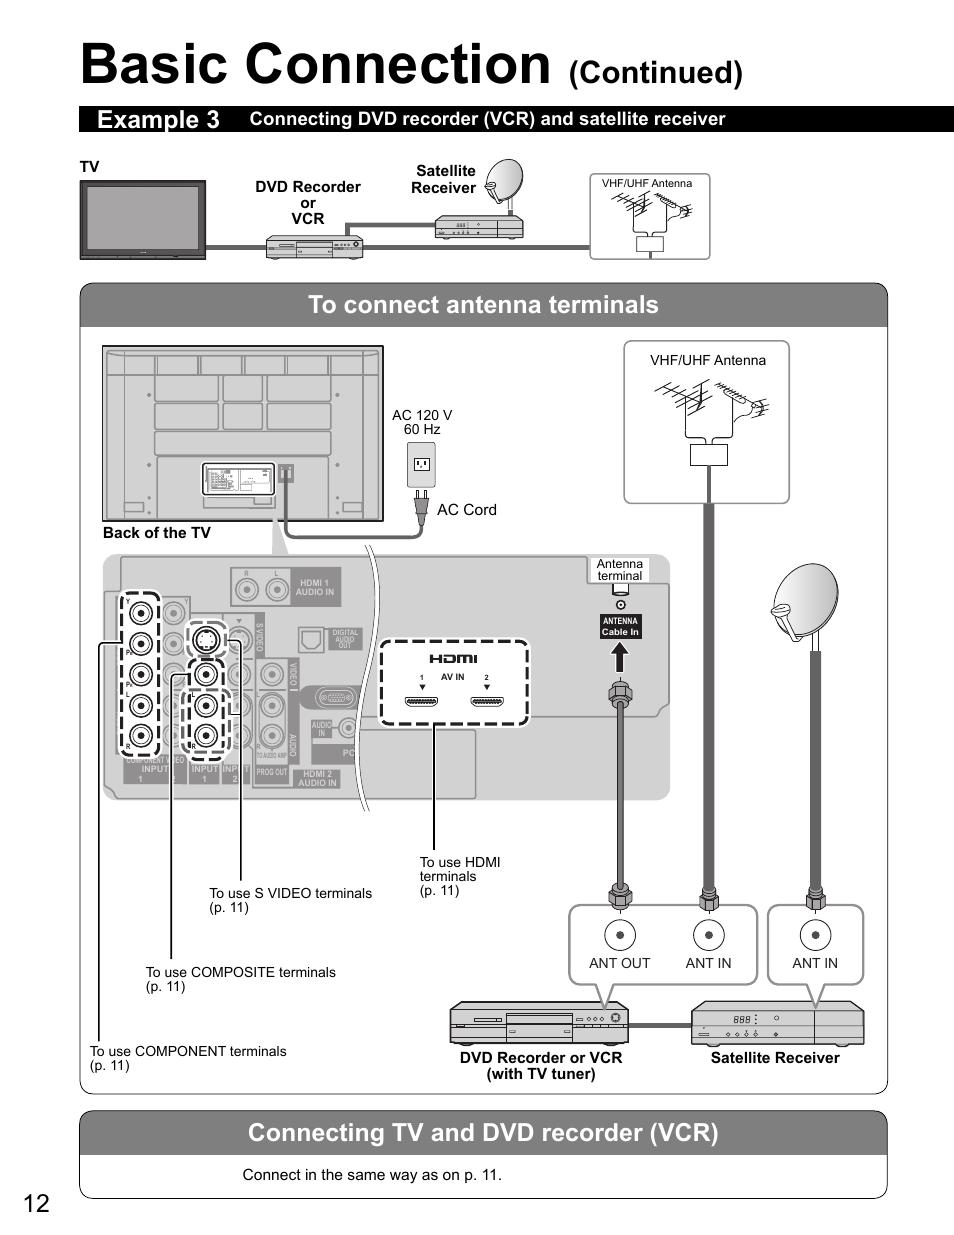 rear panel basic connection continued panasonic viva th rh manualsdir com Panasonic Plasma TV Problems Sanyo 42 Inch Plasma TV